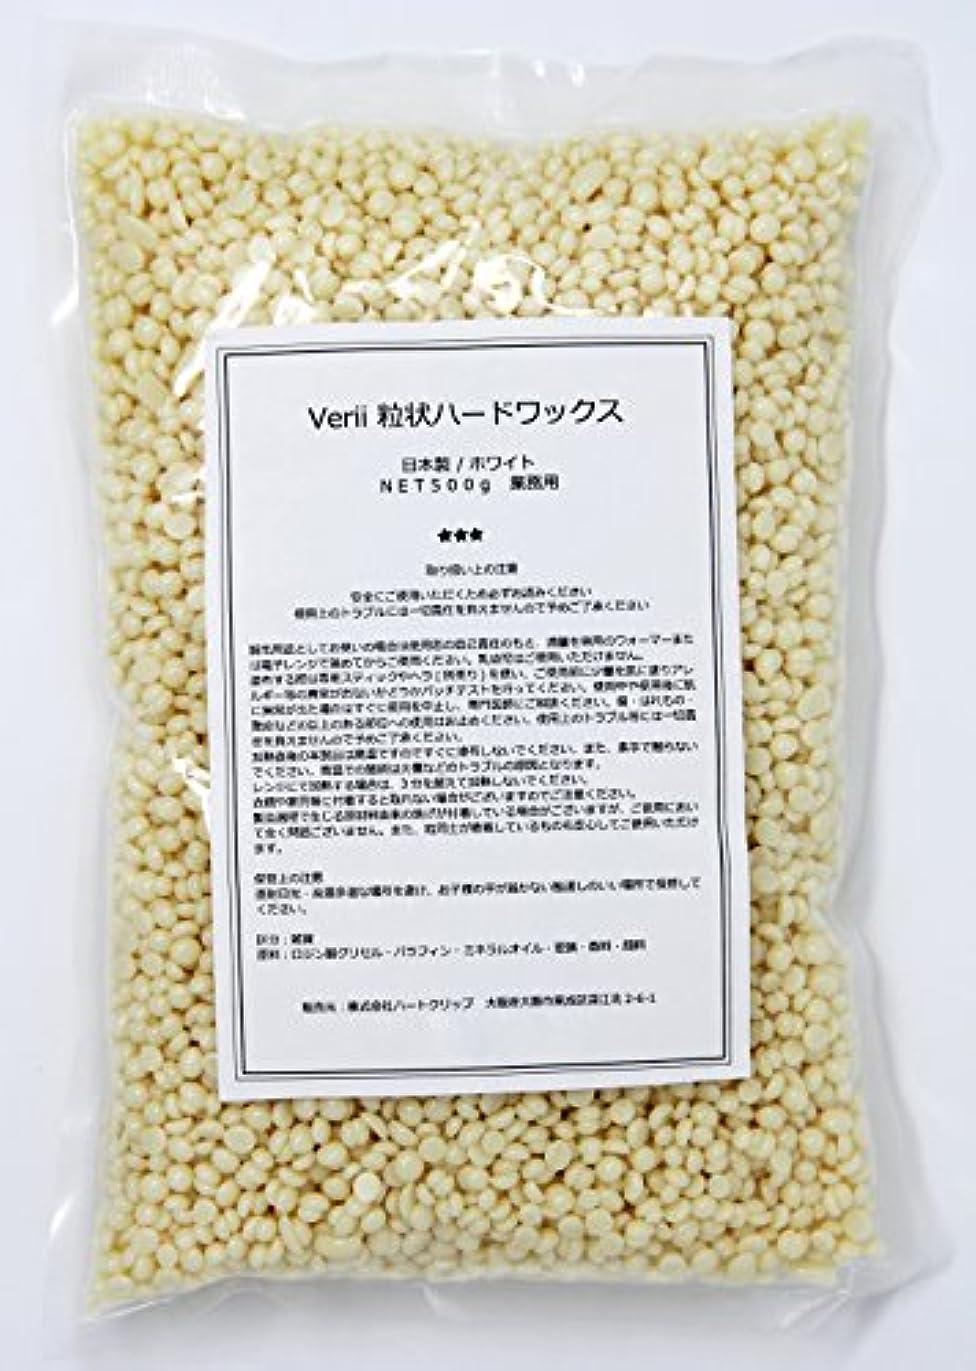 Verii 【鼻毛ワックス】粒状ハードワックス ホワイト (100g)